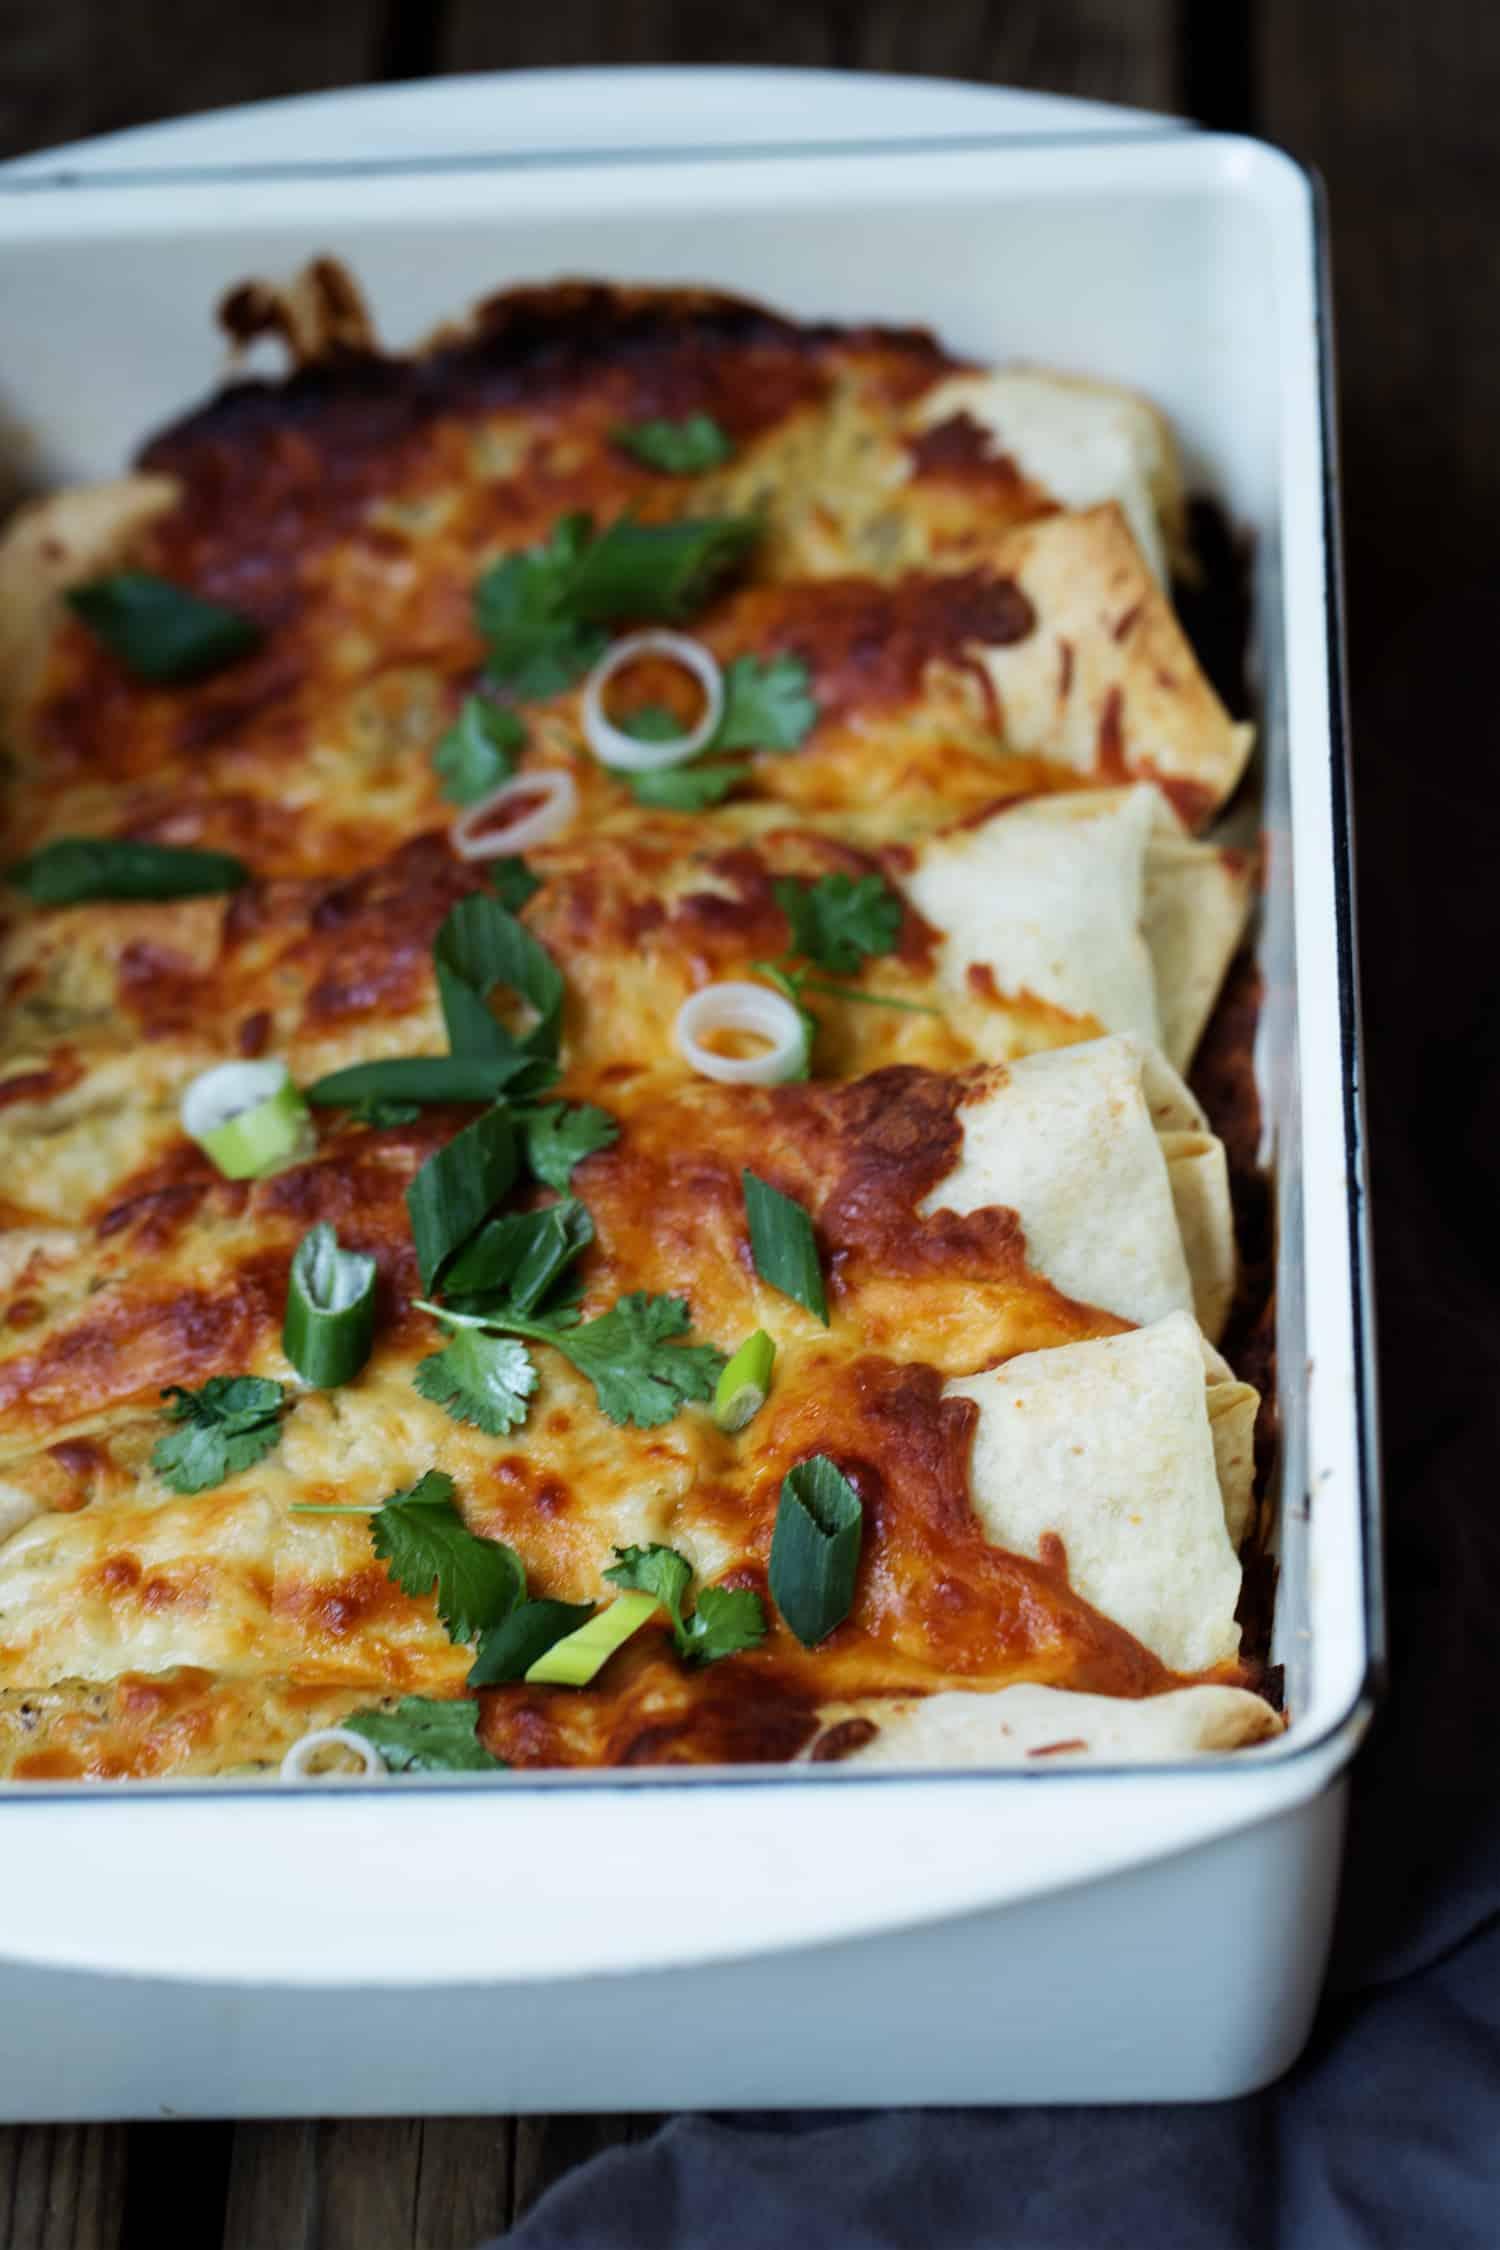 Creamy Chile Verde Chicken Enchiladas - easy meal for a crowd #MakeGameTimeSaucy #CollectiveBias